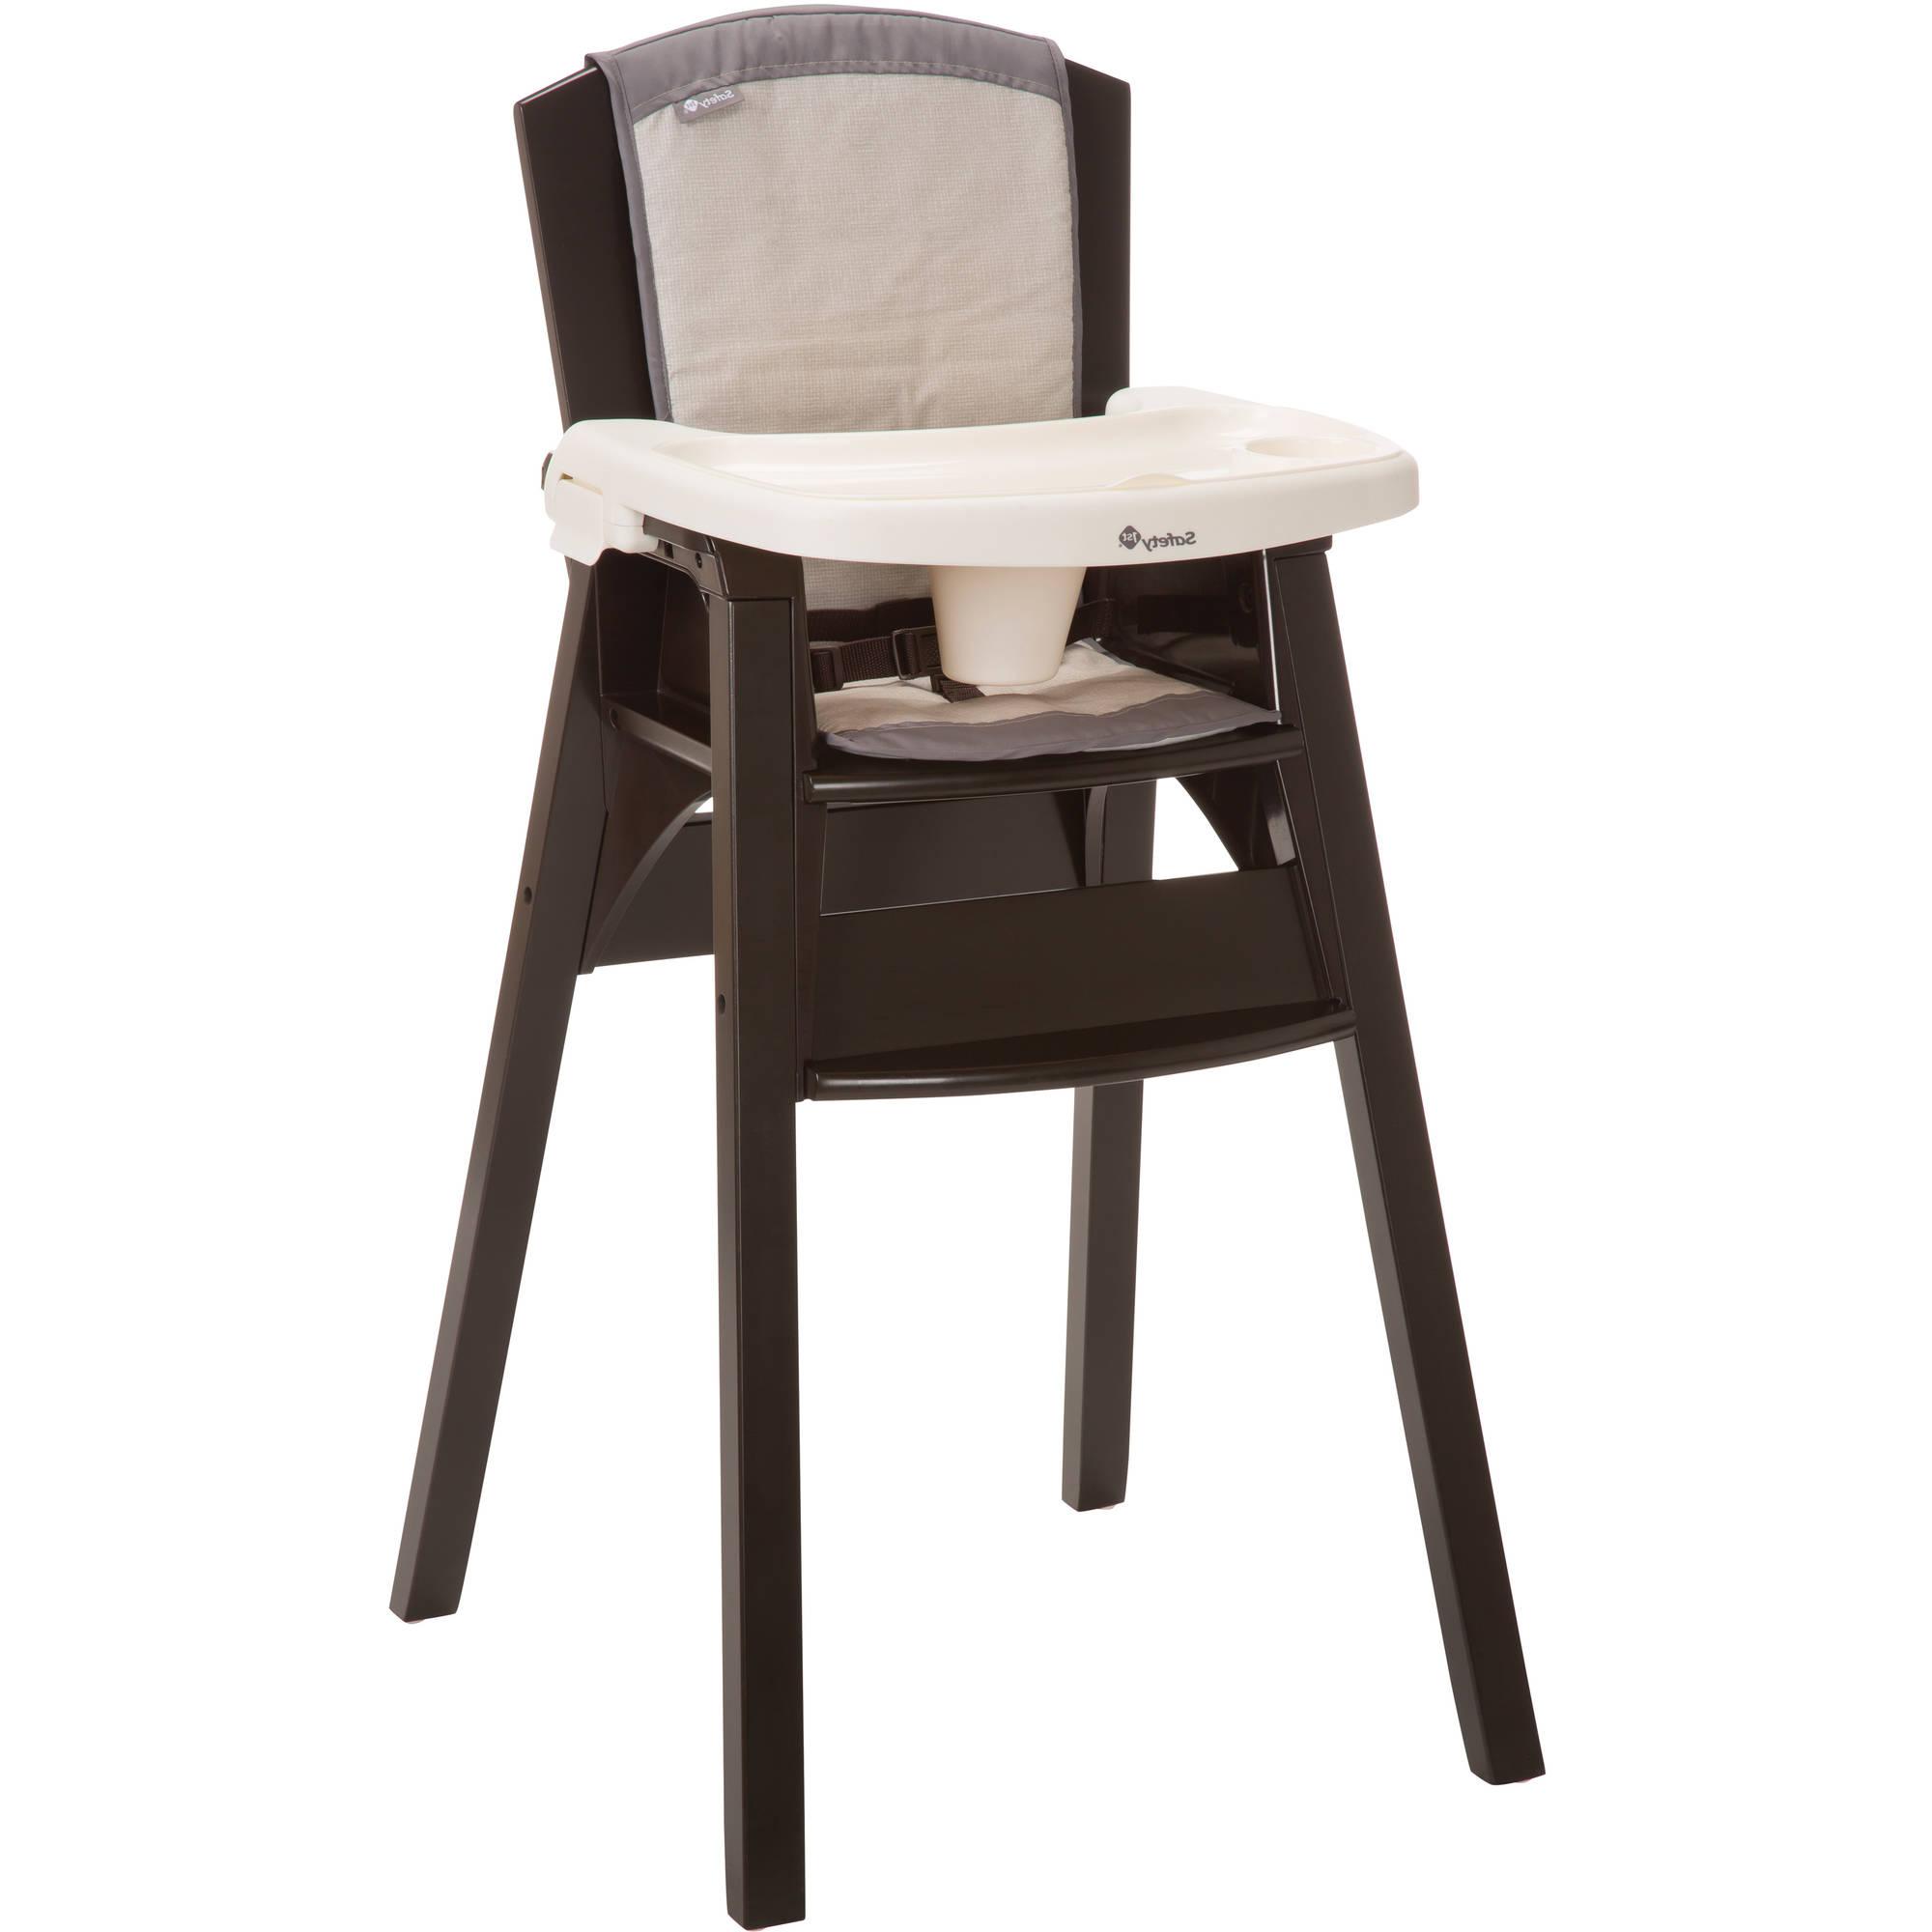 High Chair O2d5 Safety 1st Wood High Chair Beaumont Walmart